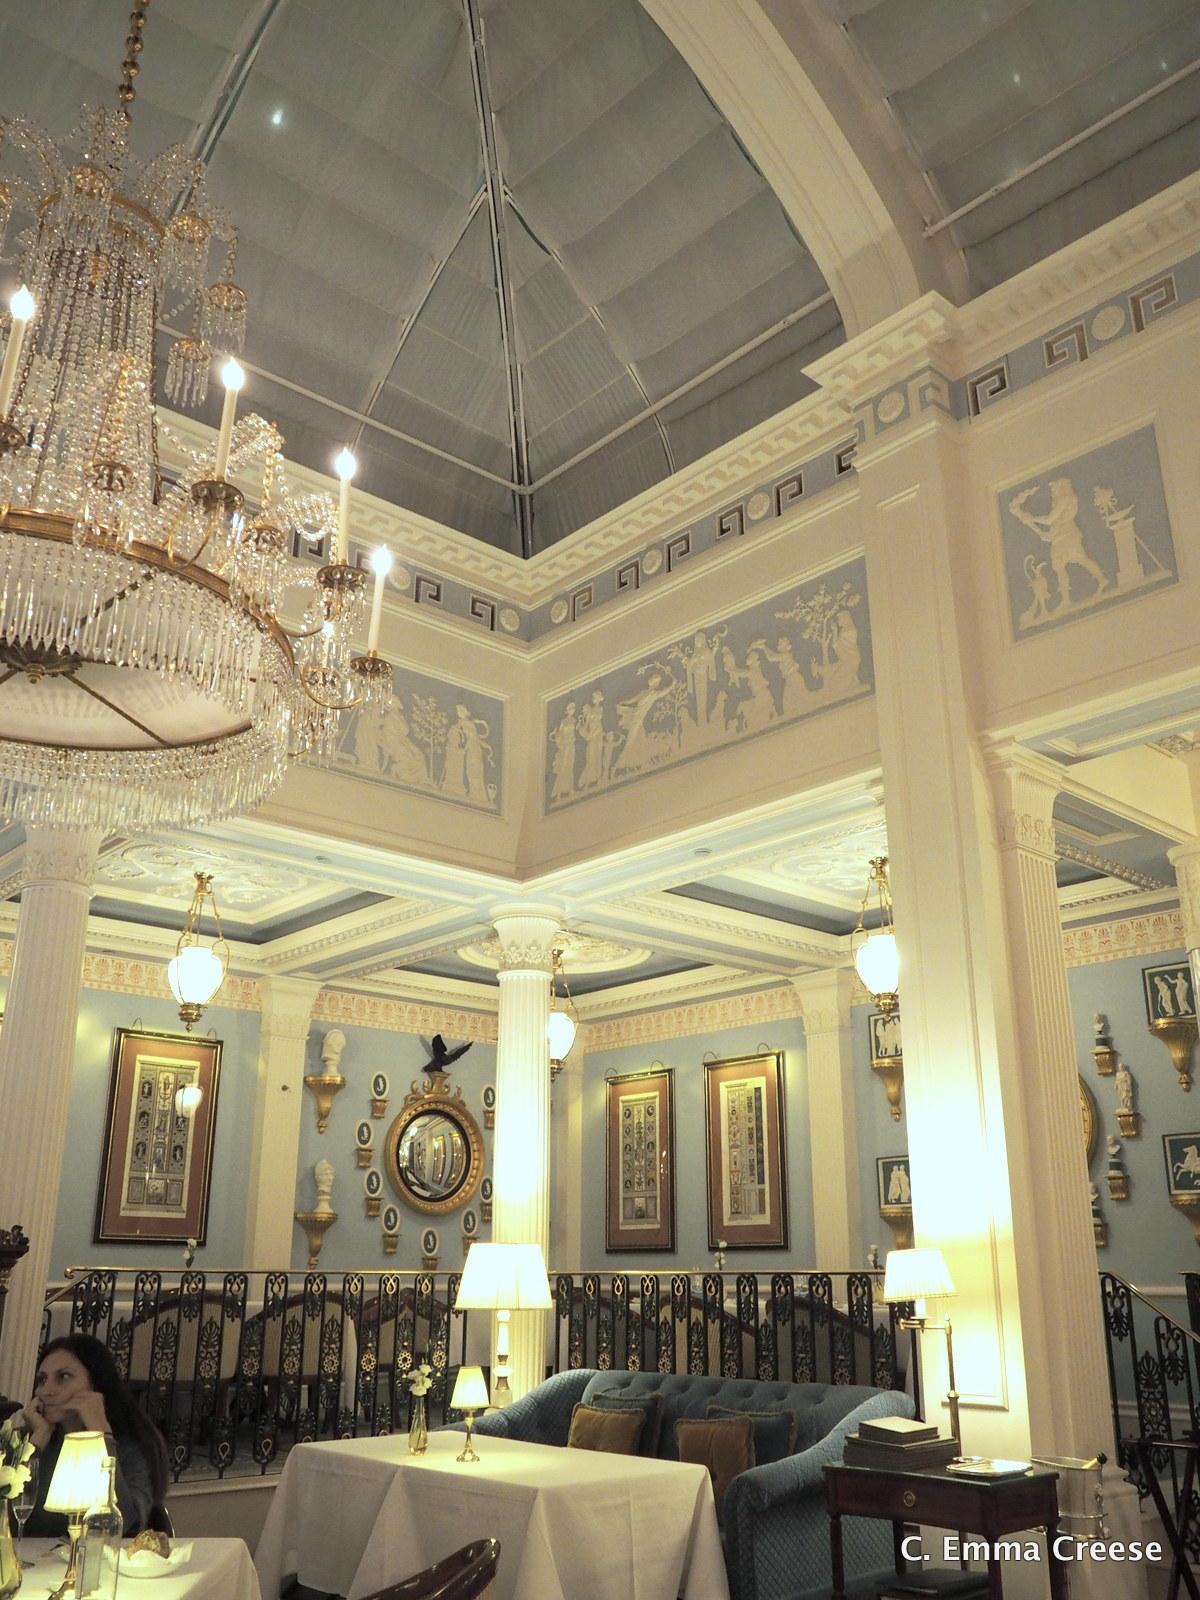 Celeste at the Lanesborough Hotel Luxury Restaurant Review Adventures of a London Kiwi